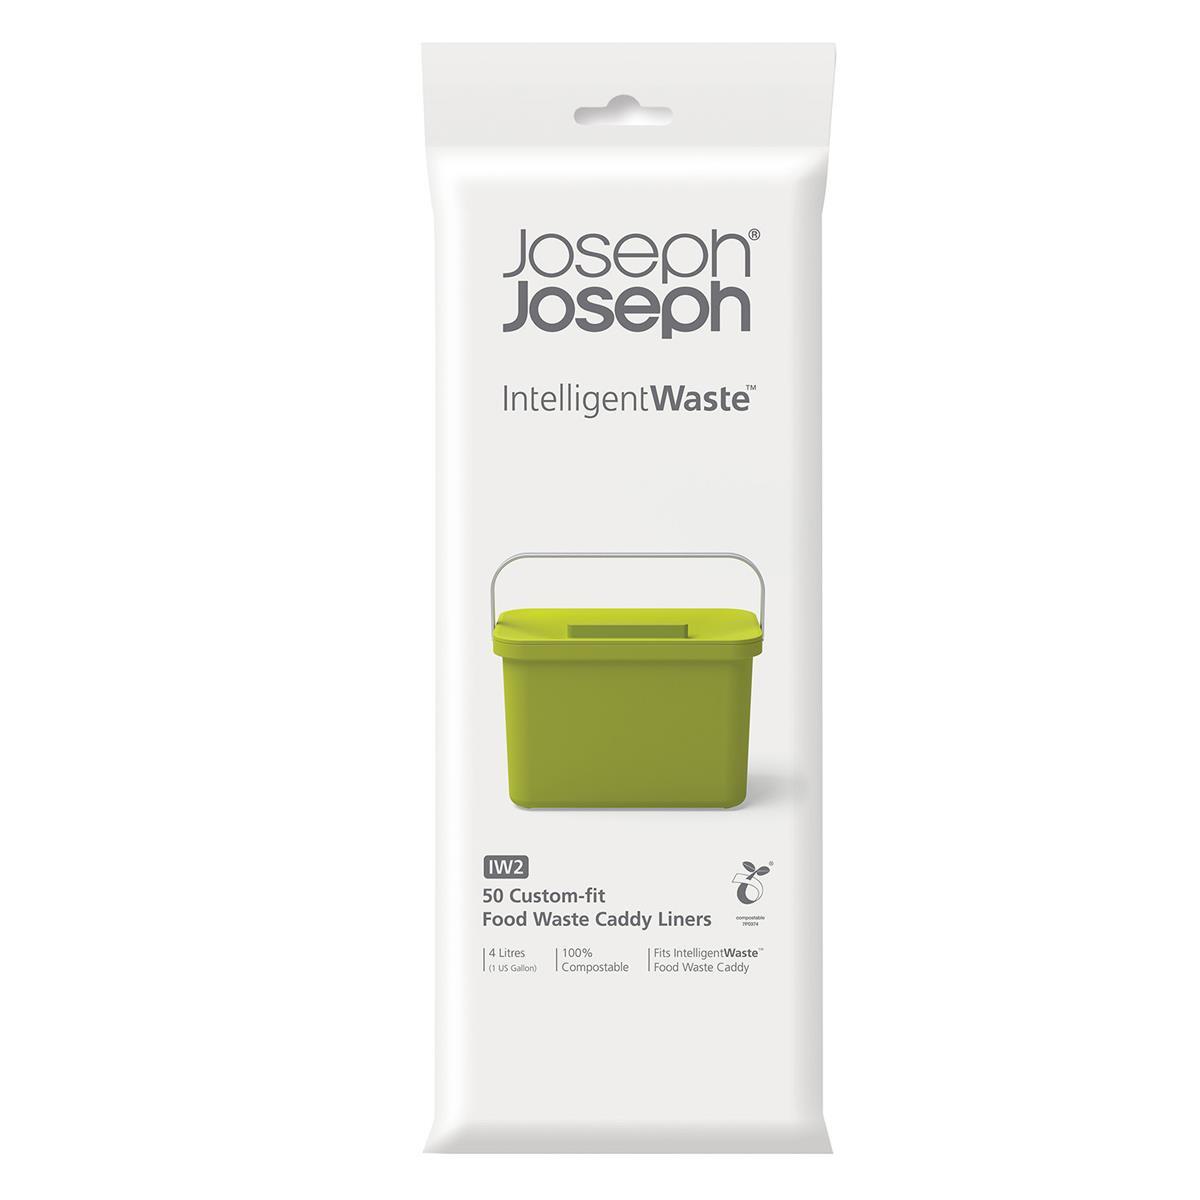 Joseph Joseph IW2 4L Food waste caddy liners